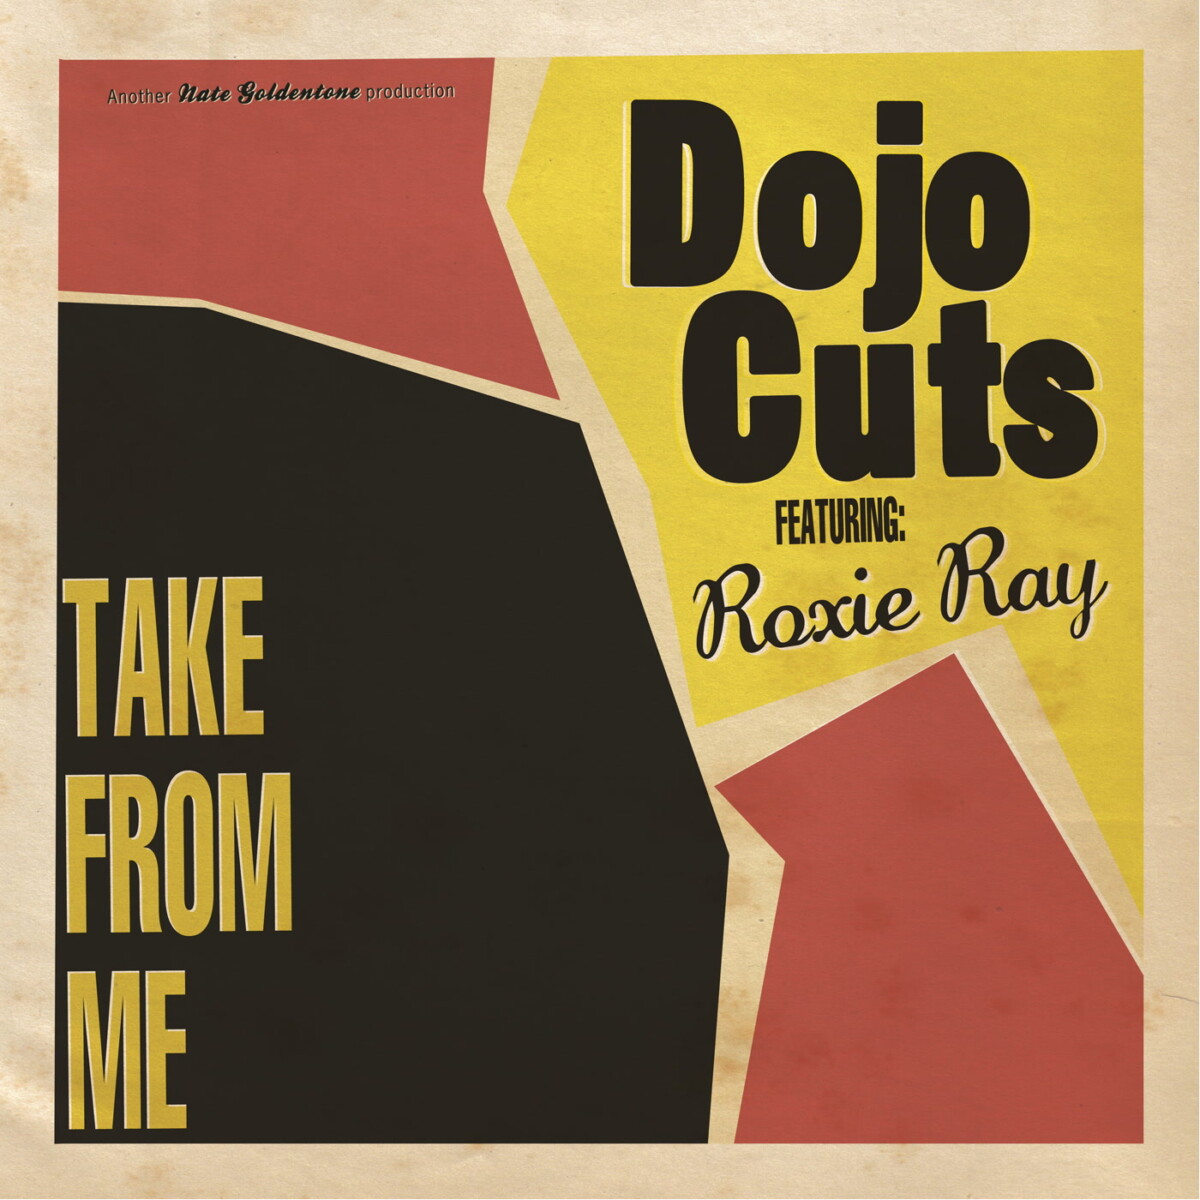 Take-From-Me-Dojo-Cuts.jpg